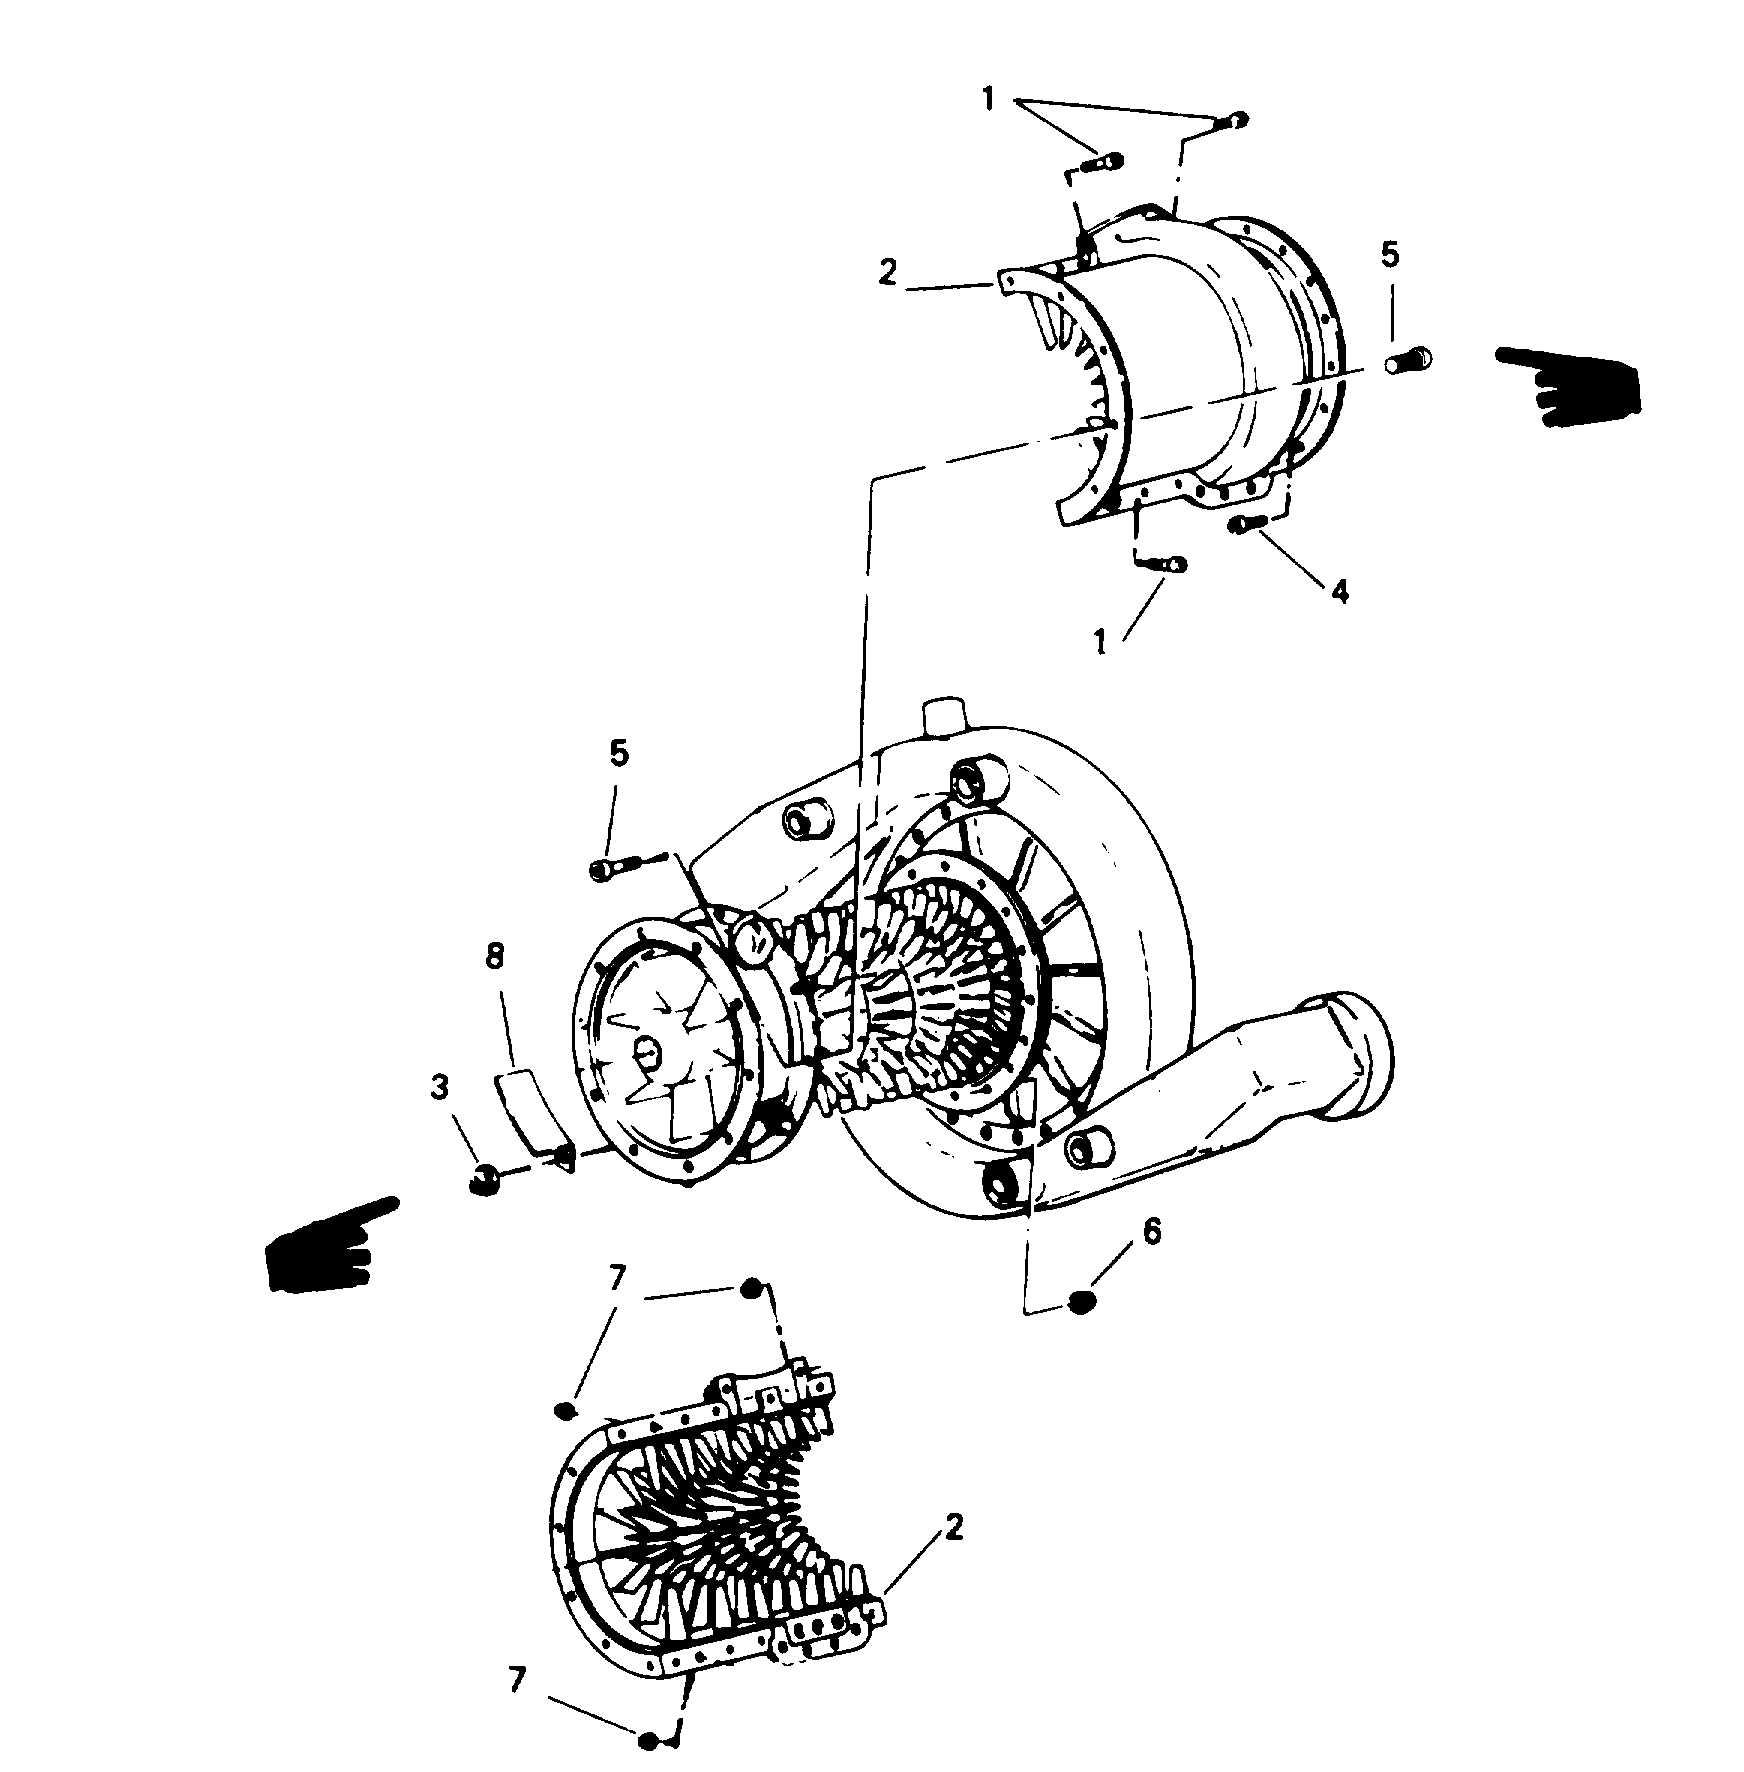 Figure 6-1 . Compressor Case Assembly